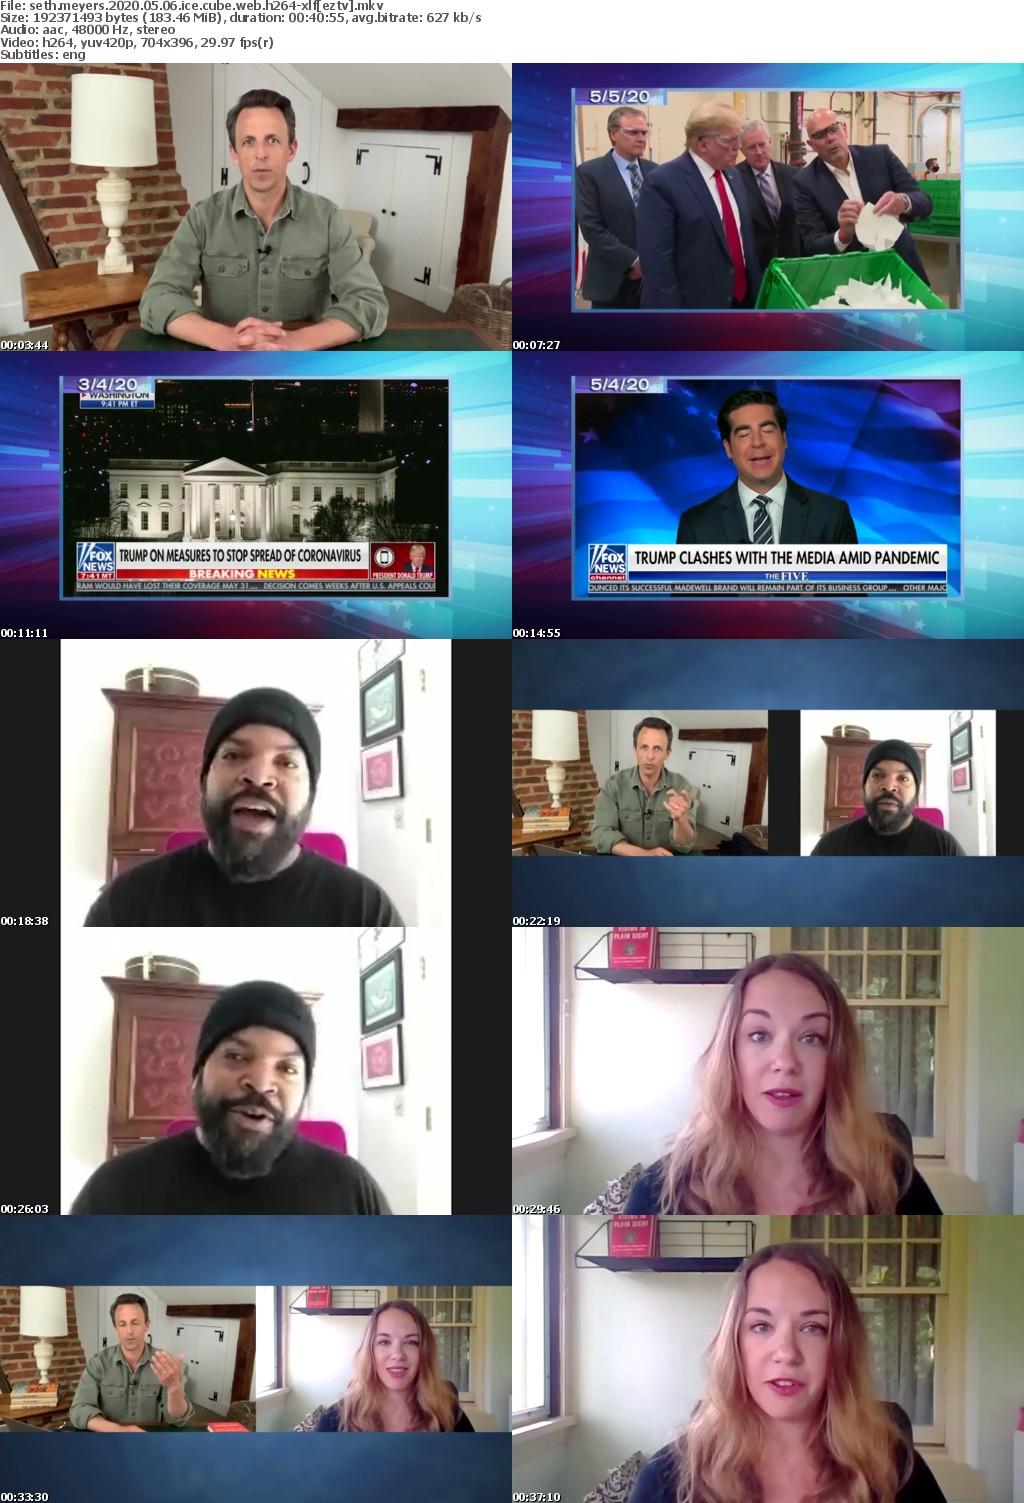 Seth Meyers 2020 05 06 Ice Cube WEB H264-XLF